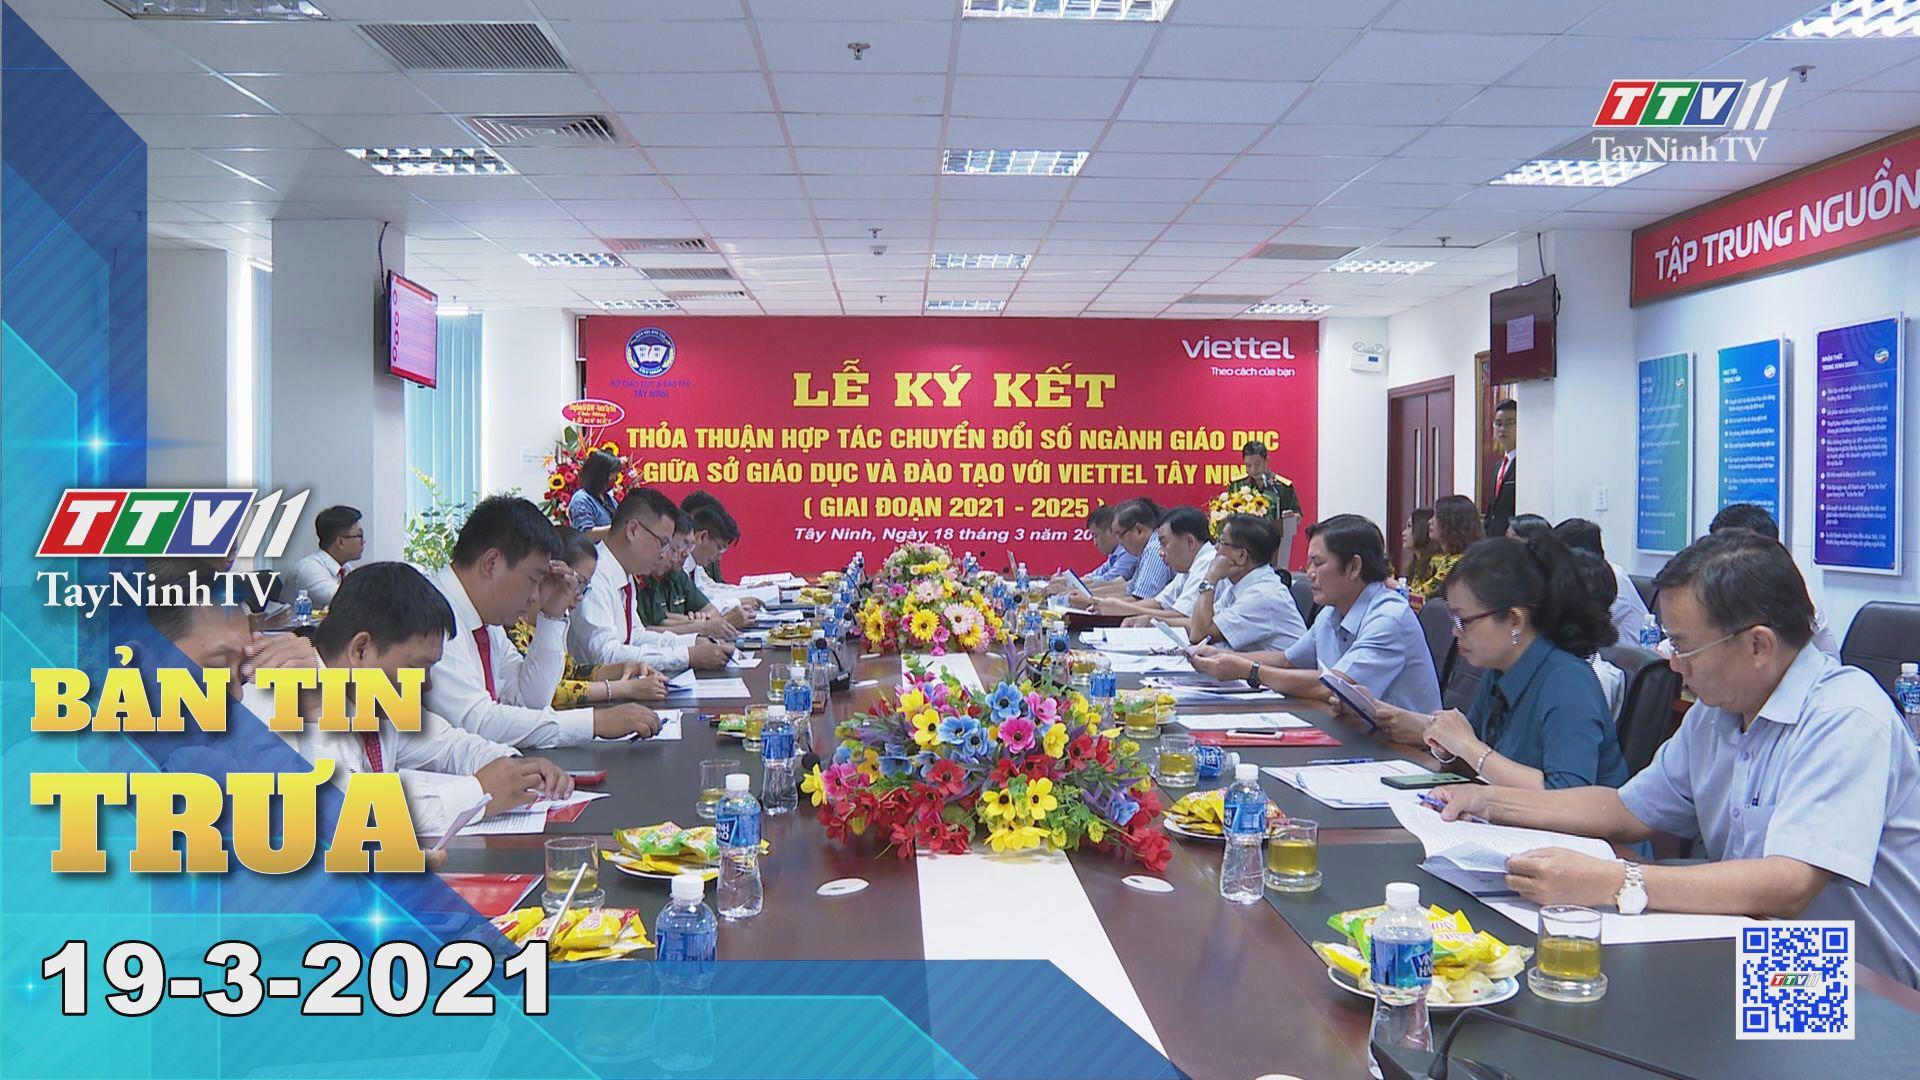 Bản tin trưa 19-3-2021 | Tin tức hôm nay | TayNinhTV